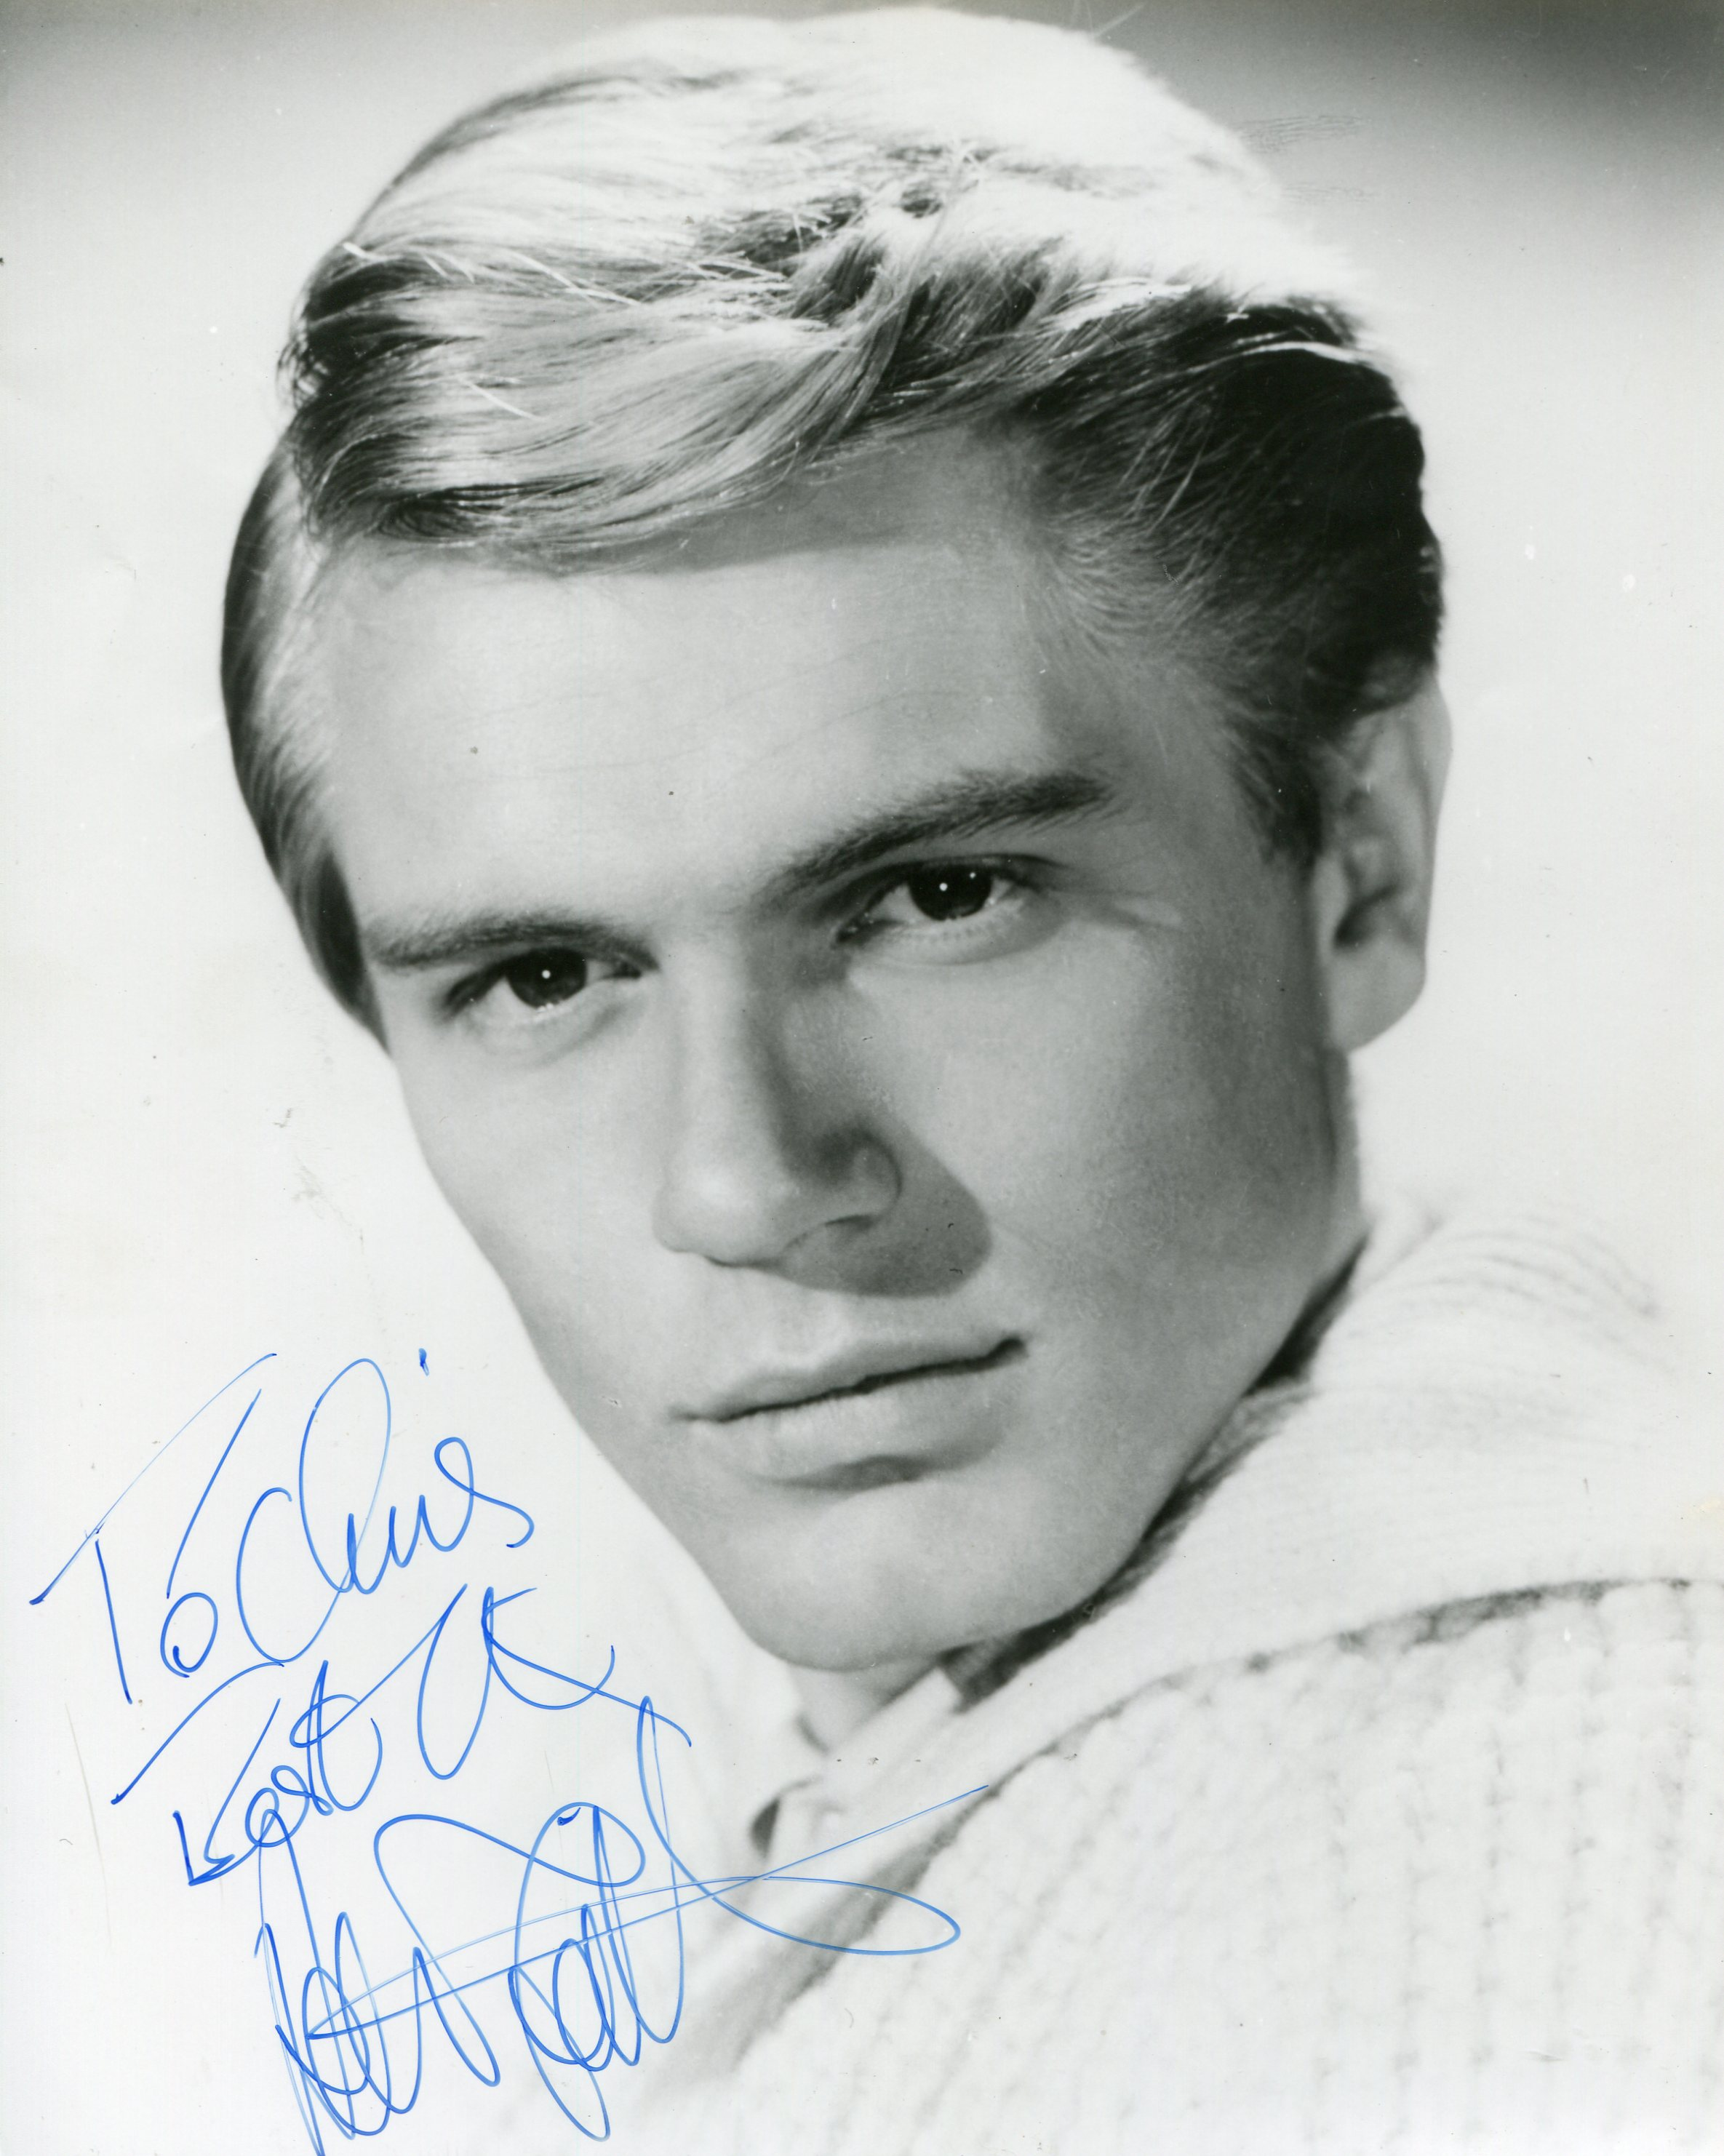 Adam Faith Archives - Movies  Autographed Portraits Through The -4638